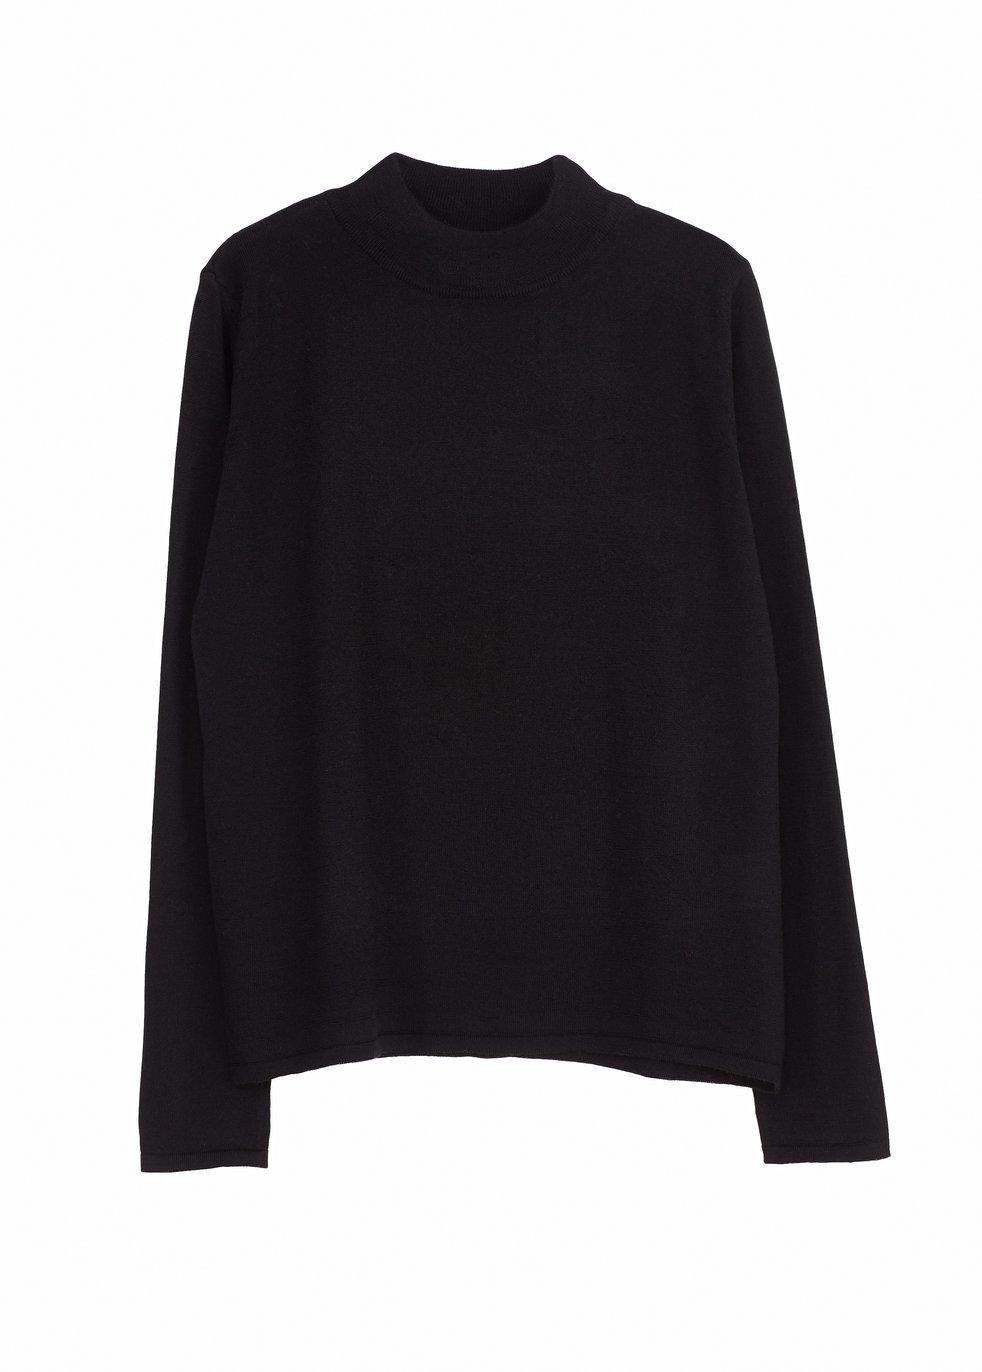 ARELA Joan Merino Wool Sweater In Black